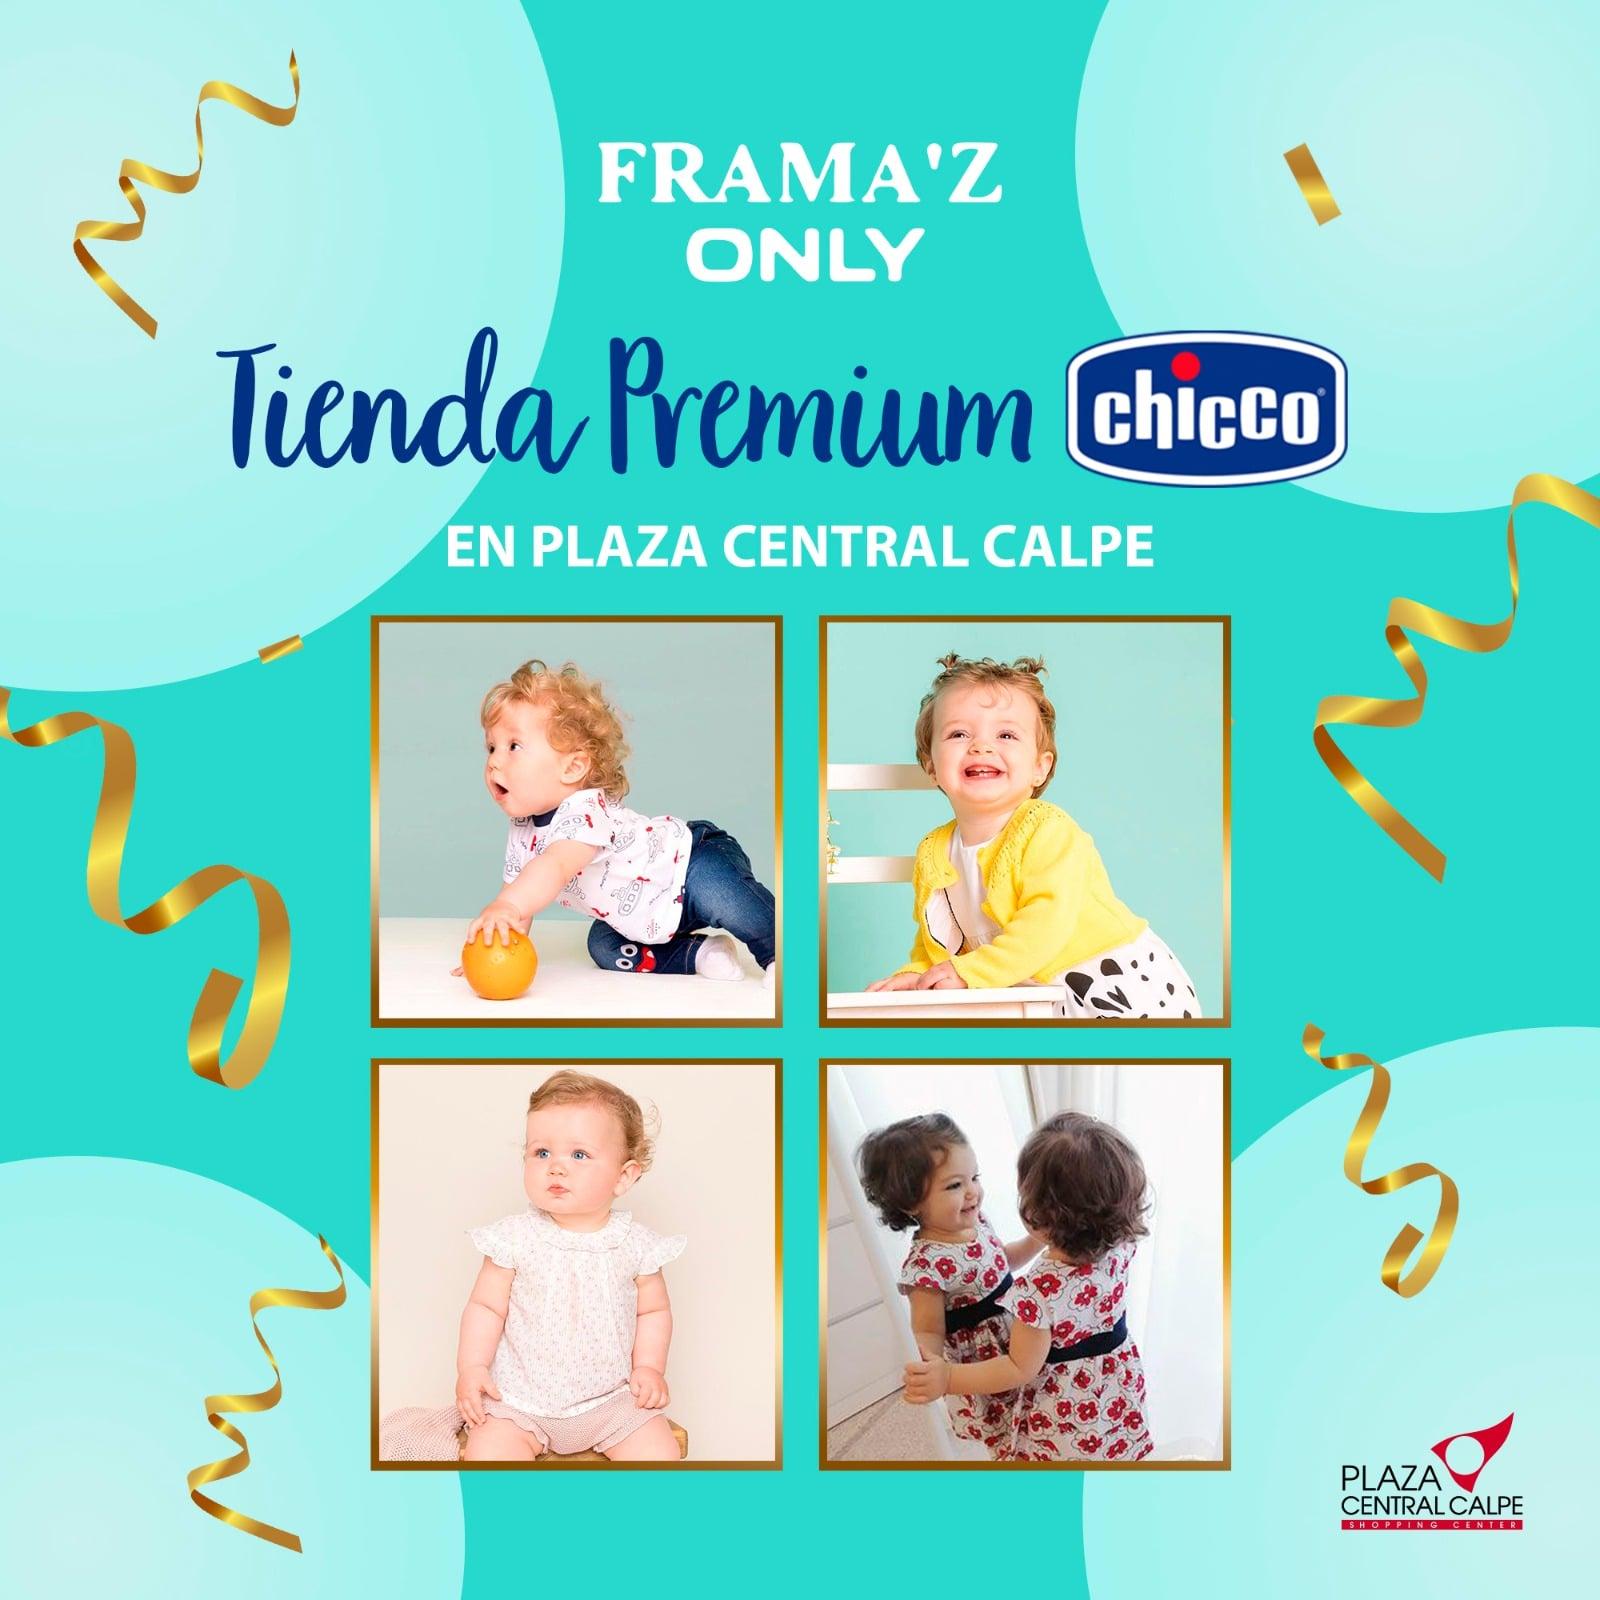 Frama CHICCO